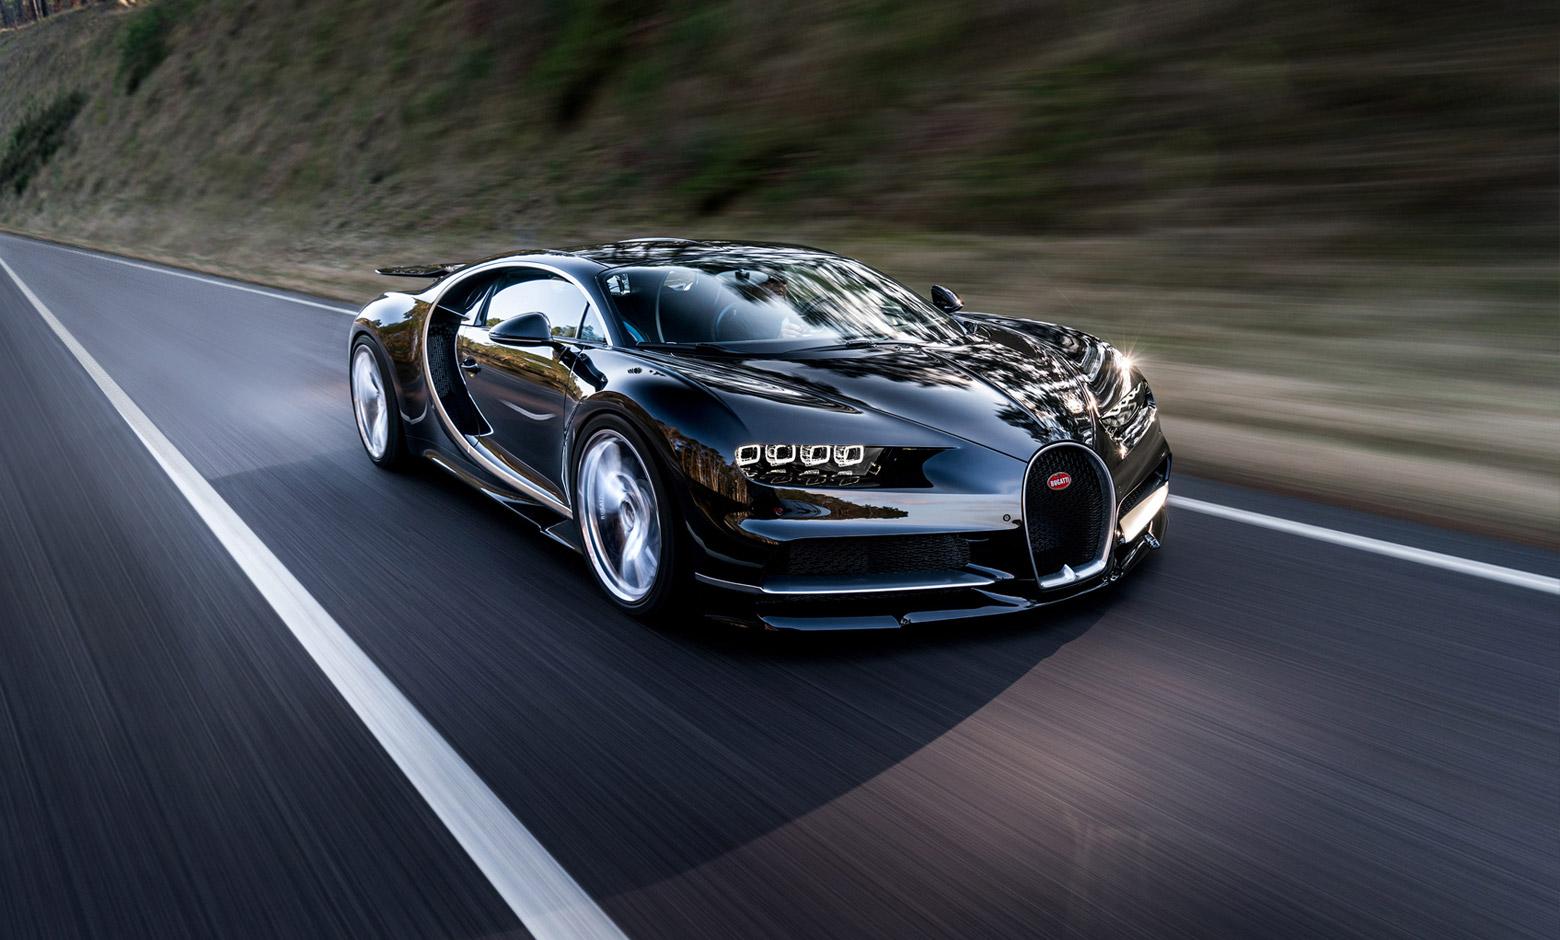 92B252812529 Άκου τα 1500 άλογα και θαύμασε την Bugatti Chiron Bugatti, Bugatti Chiron, Car sound, hypercar, supercars, top speed, videos